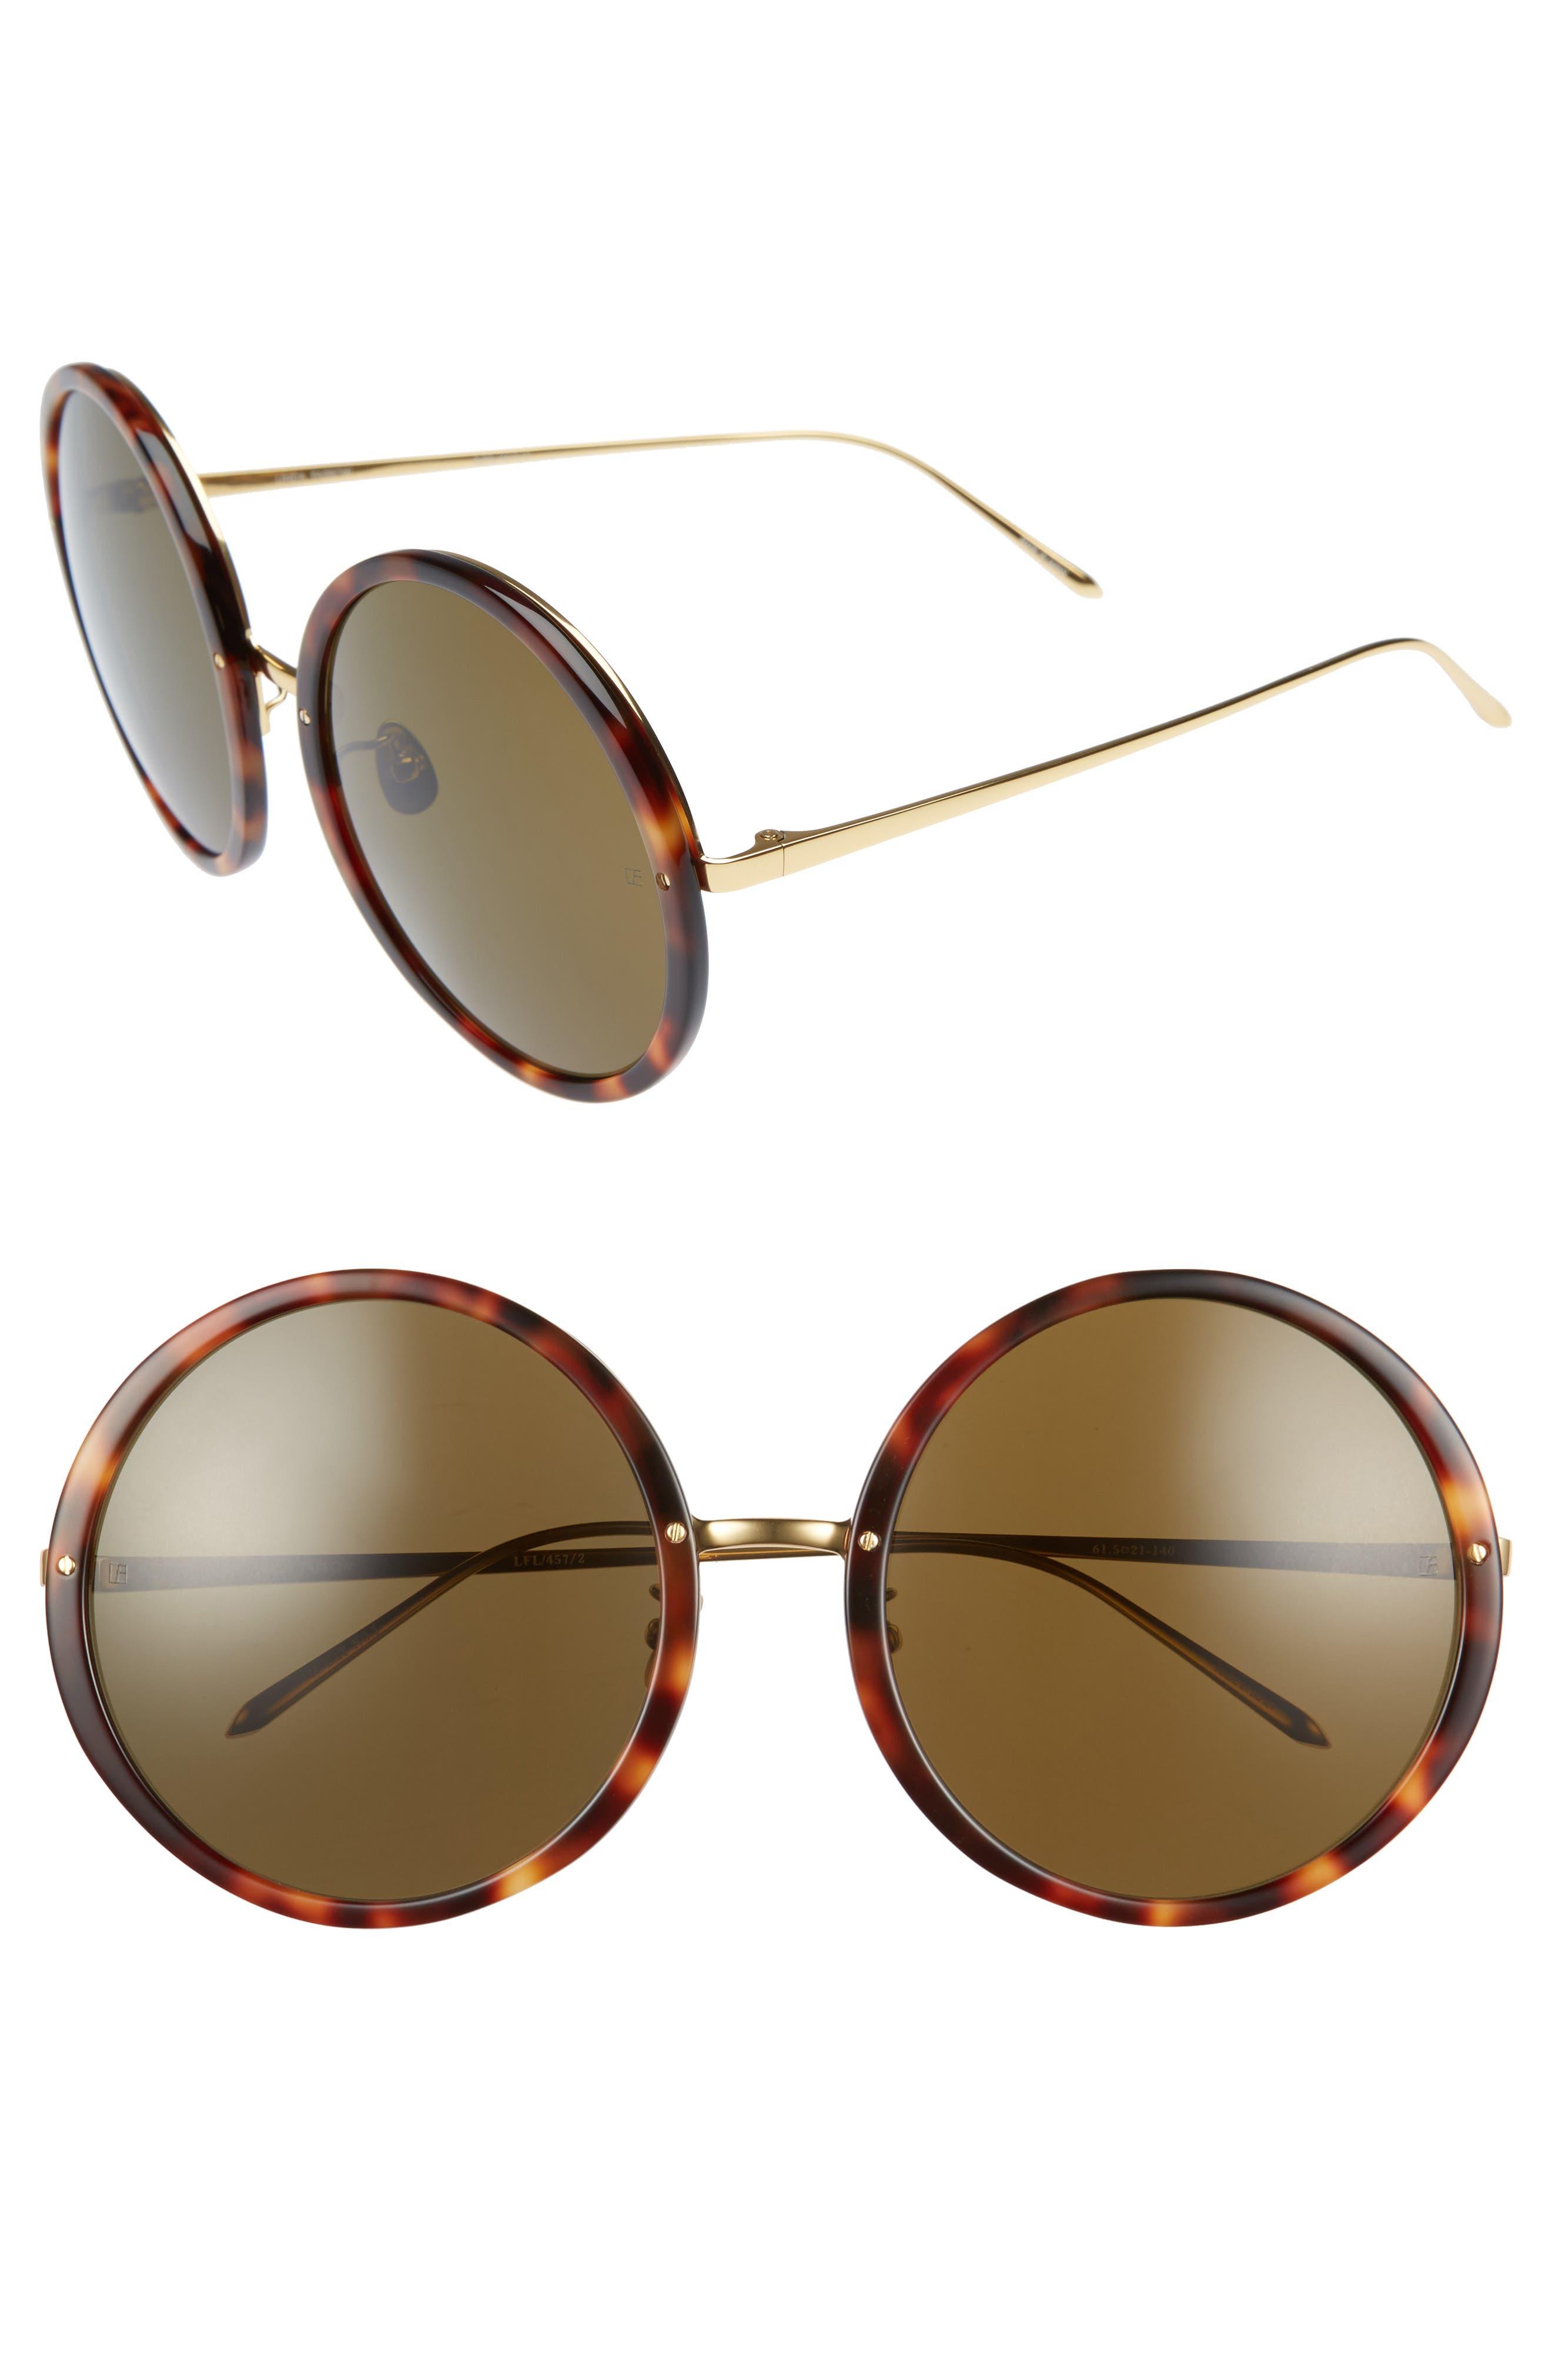 61mm Round 18 Karat Gold Trim Sunglasses,                             Main thumbnail 1, color,                             Tortoise/ Yellow Gold/ Brown